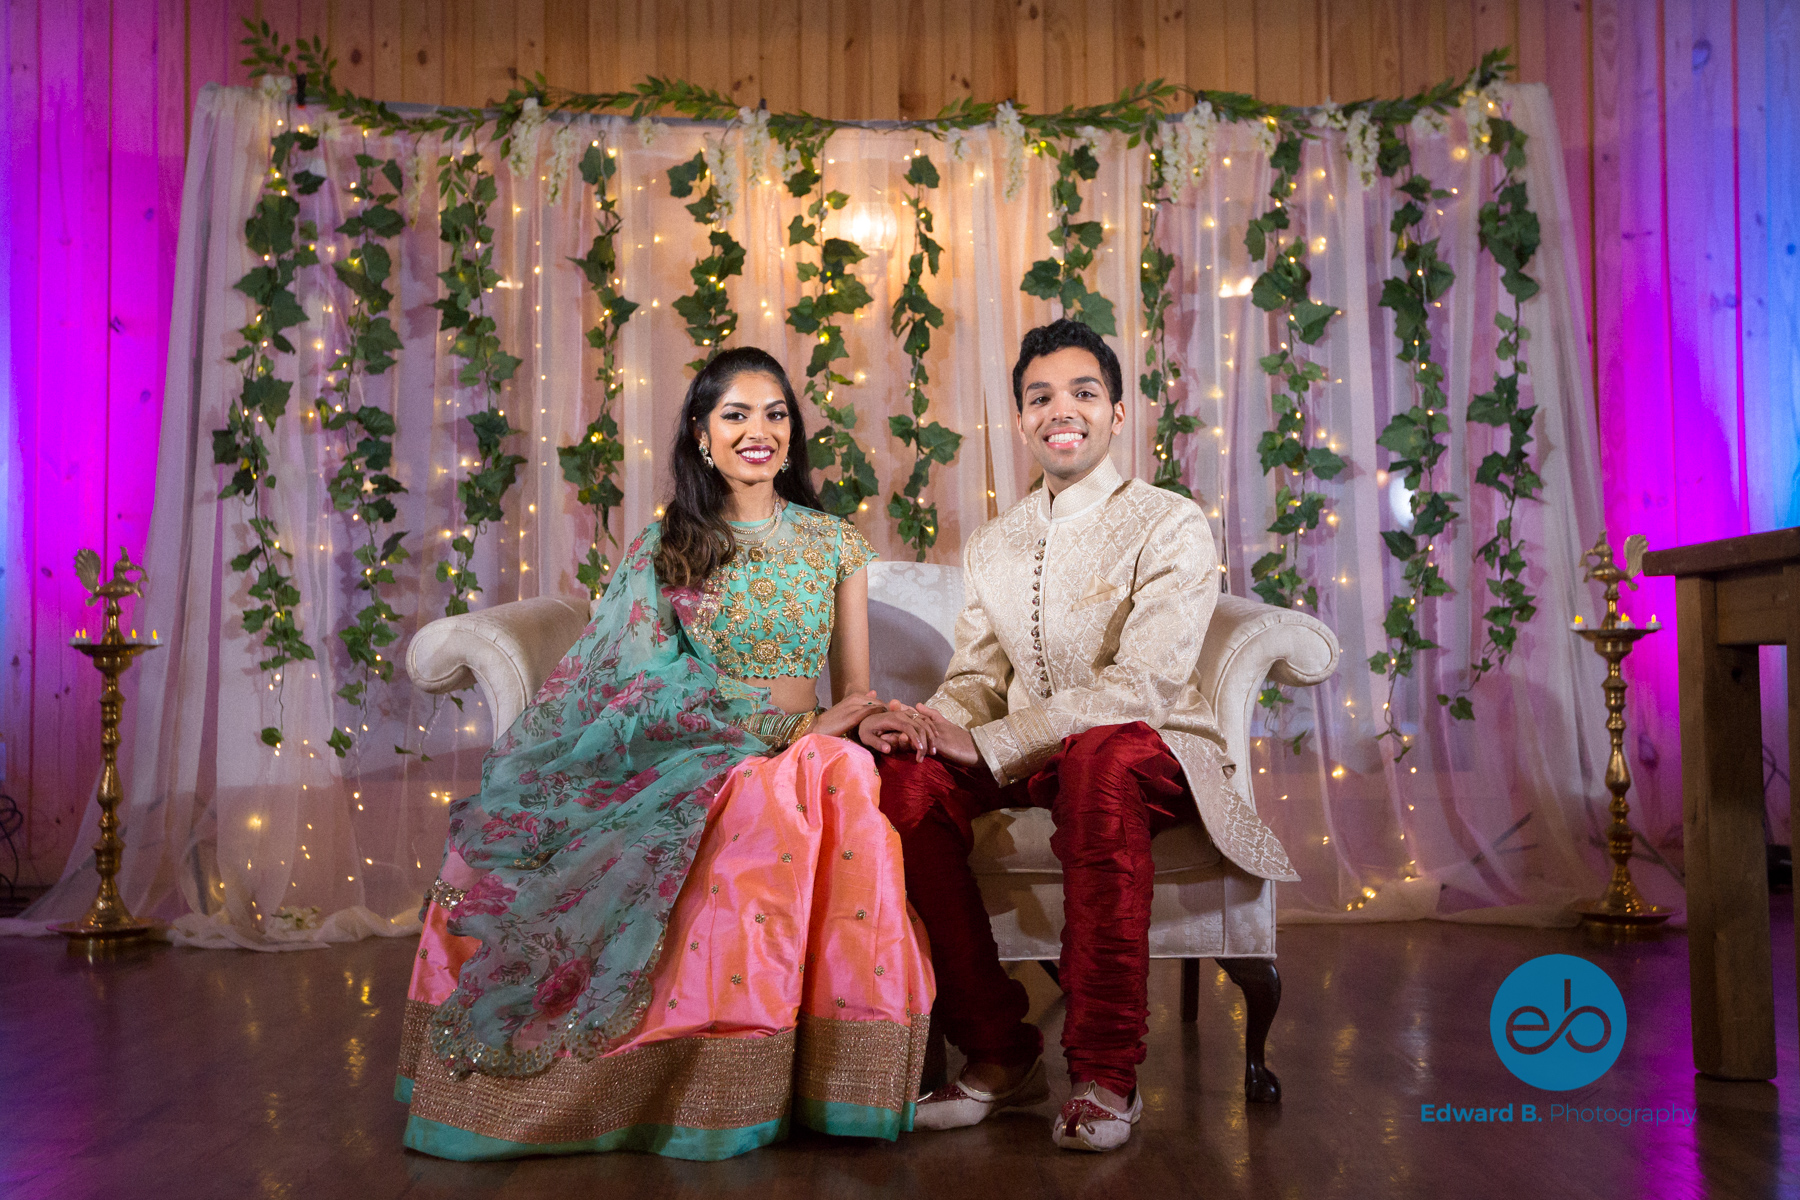 indian-wedding-engagement-reception-san-antonio-austin-texas-8.jpg